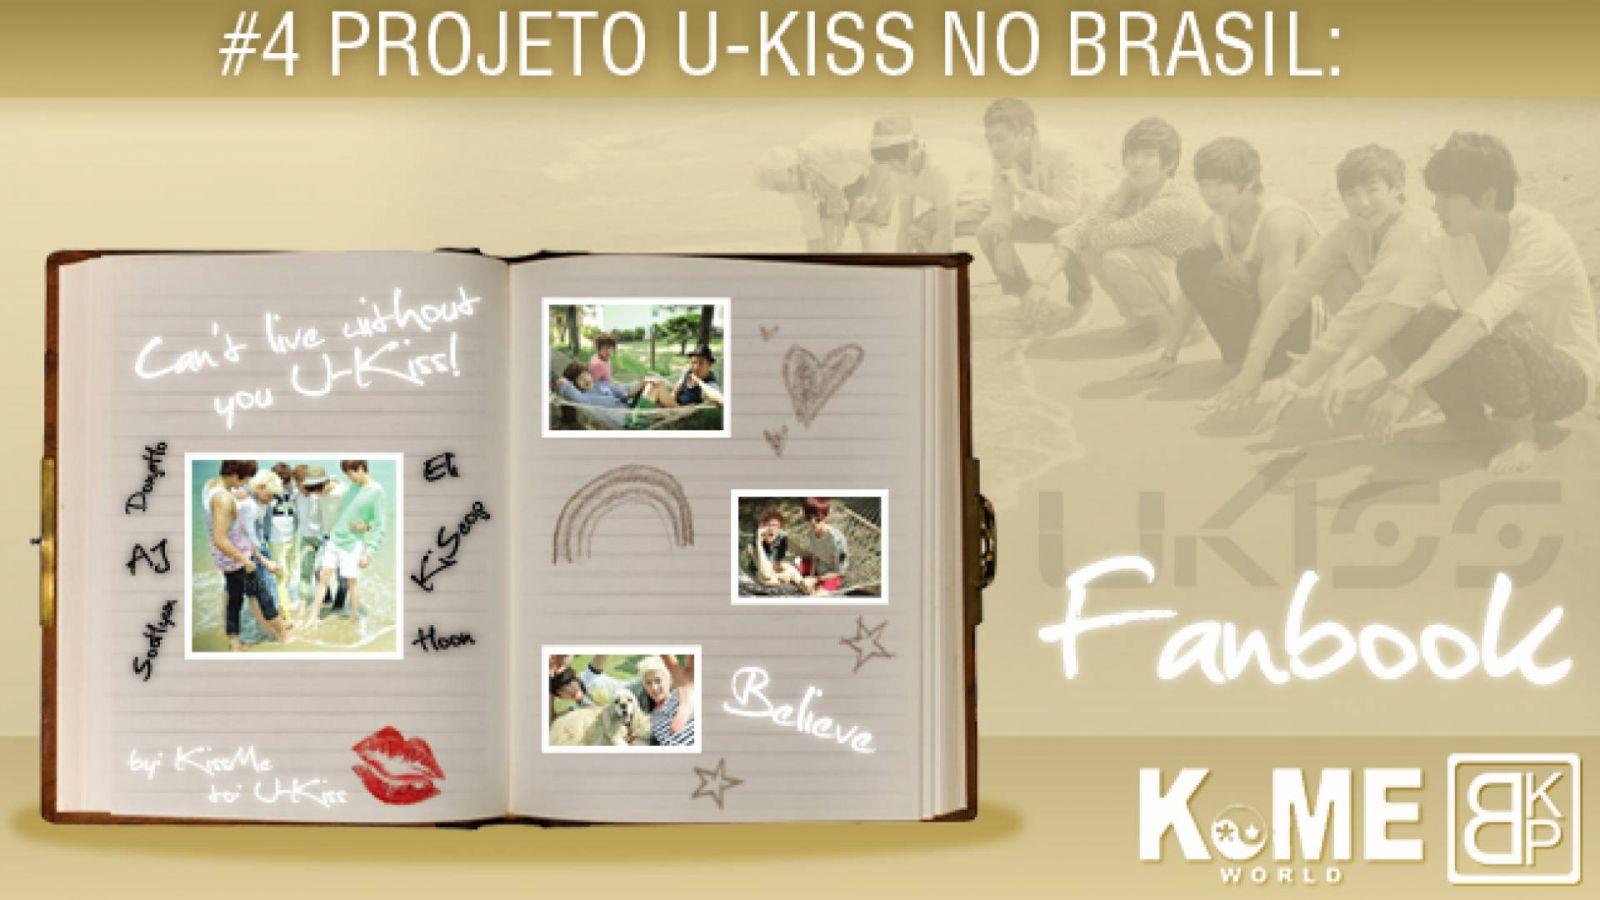 Projeto U-KISS no Brasil: FANBOOK © Caroline Manôn